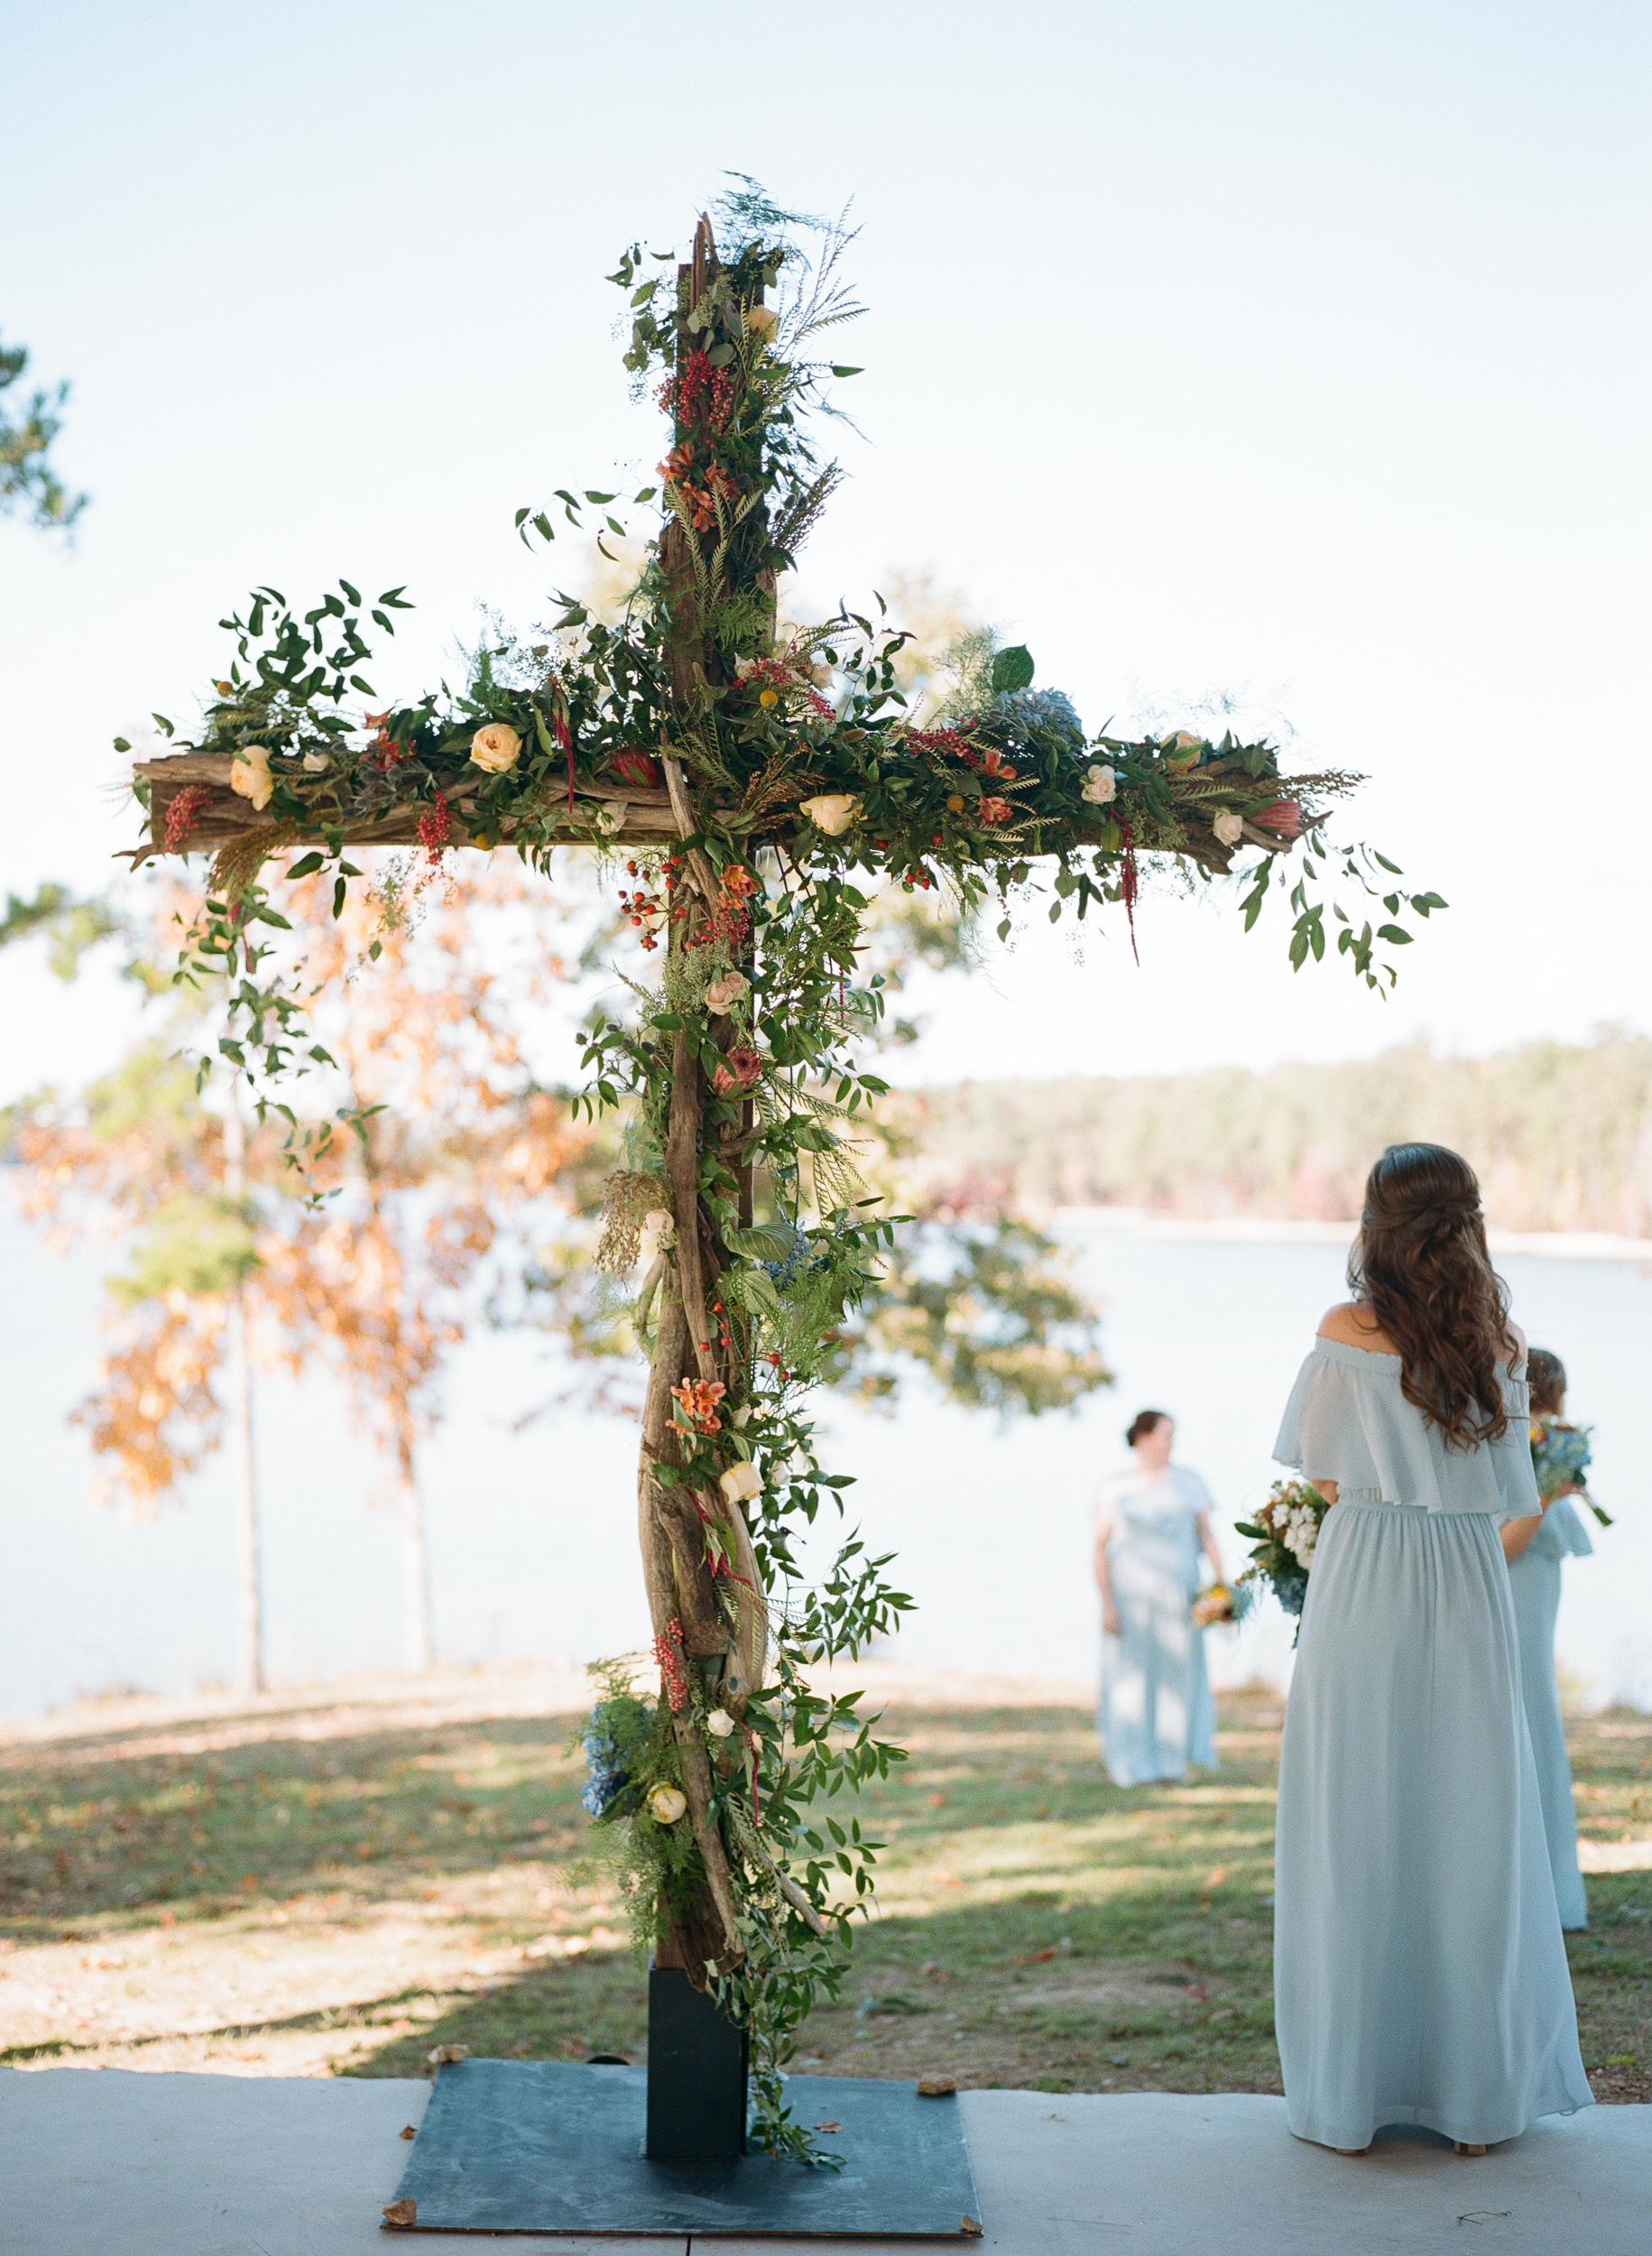 SK_Wedding_JackieLuke_Blog-15.jpg